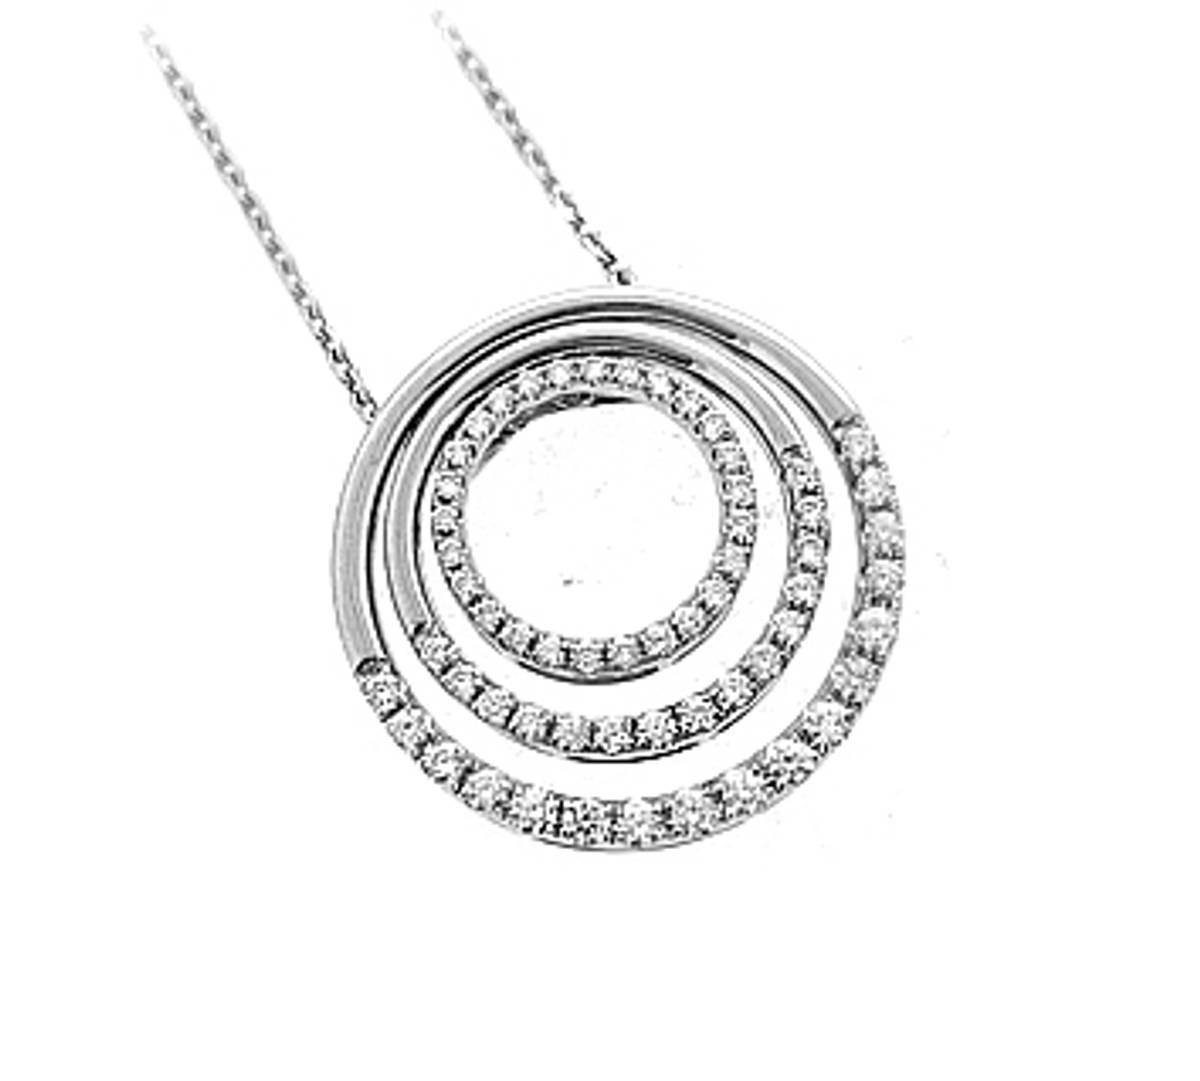 "18k white gold brilliant cut diamond circle pendant on 18k white gold 18"" chainDETAILSCarat: total diamond weight 0.73ctsMetal: 18k white gold Made in Ireland"